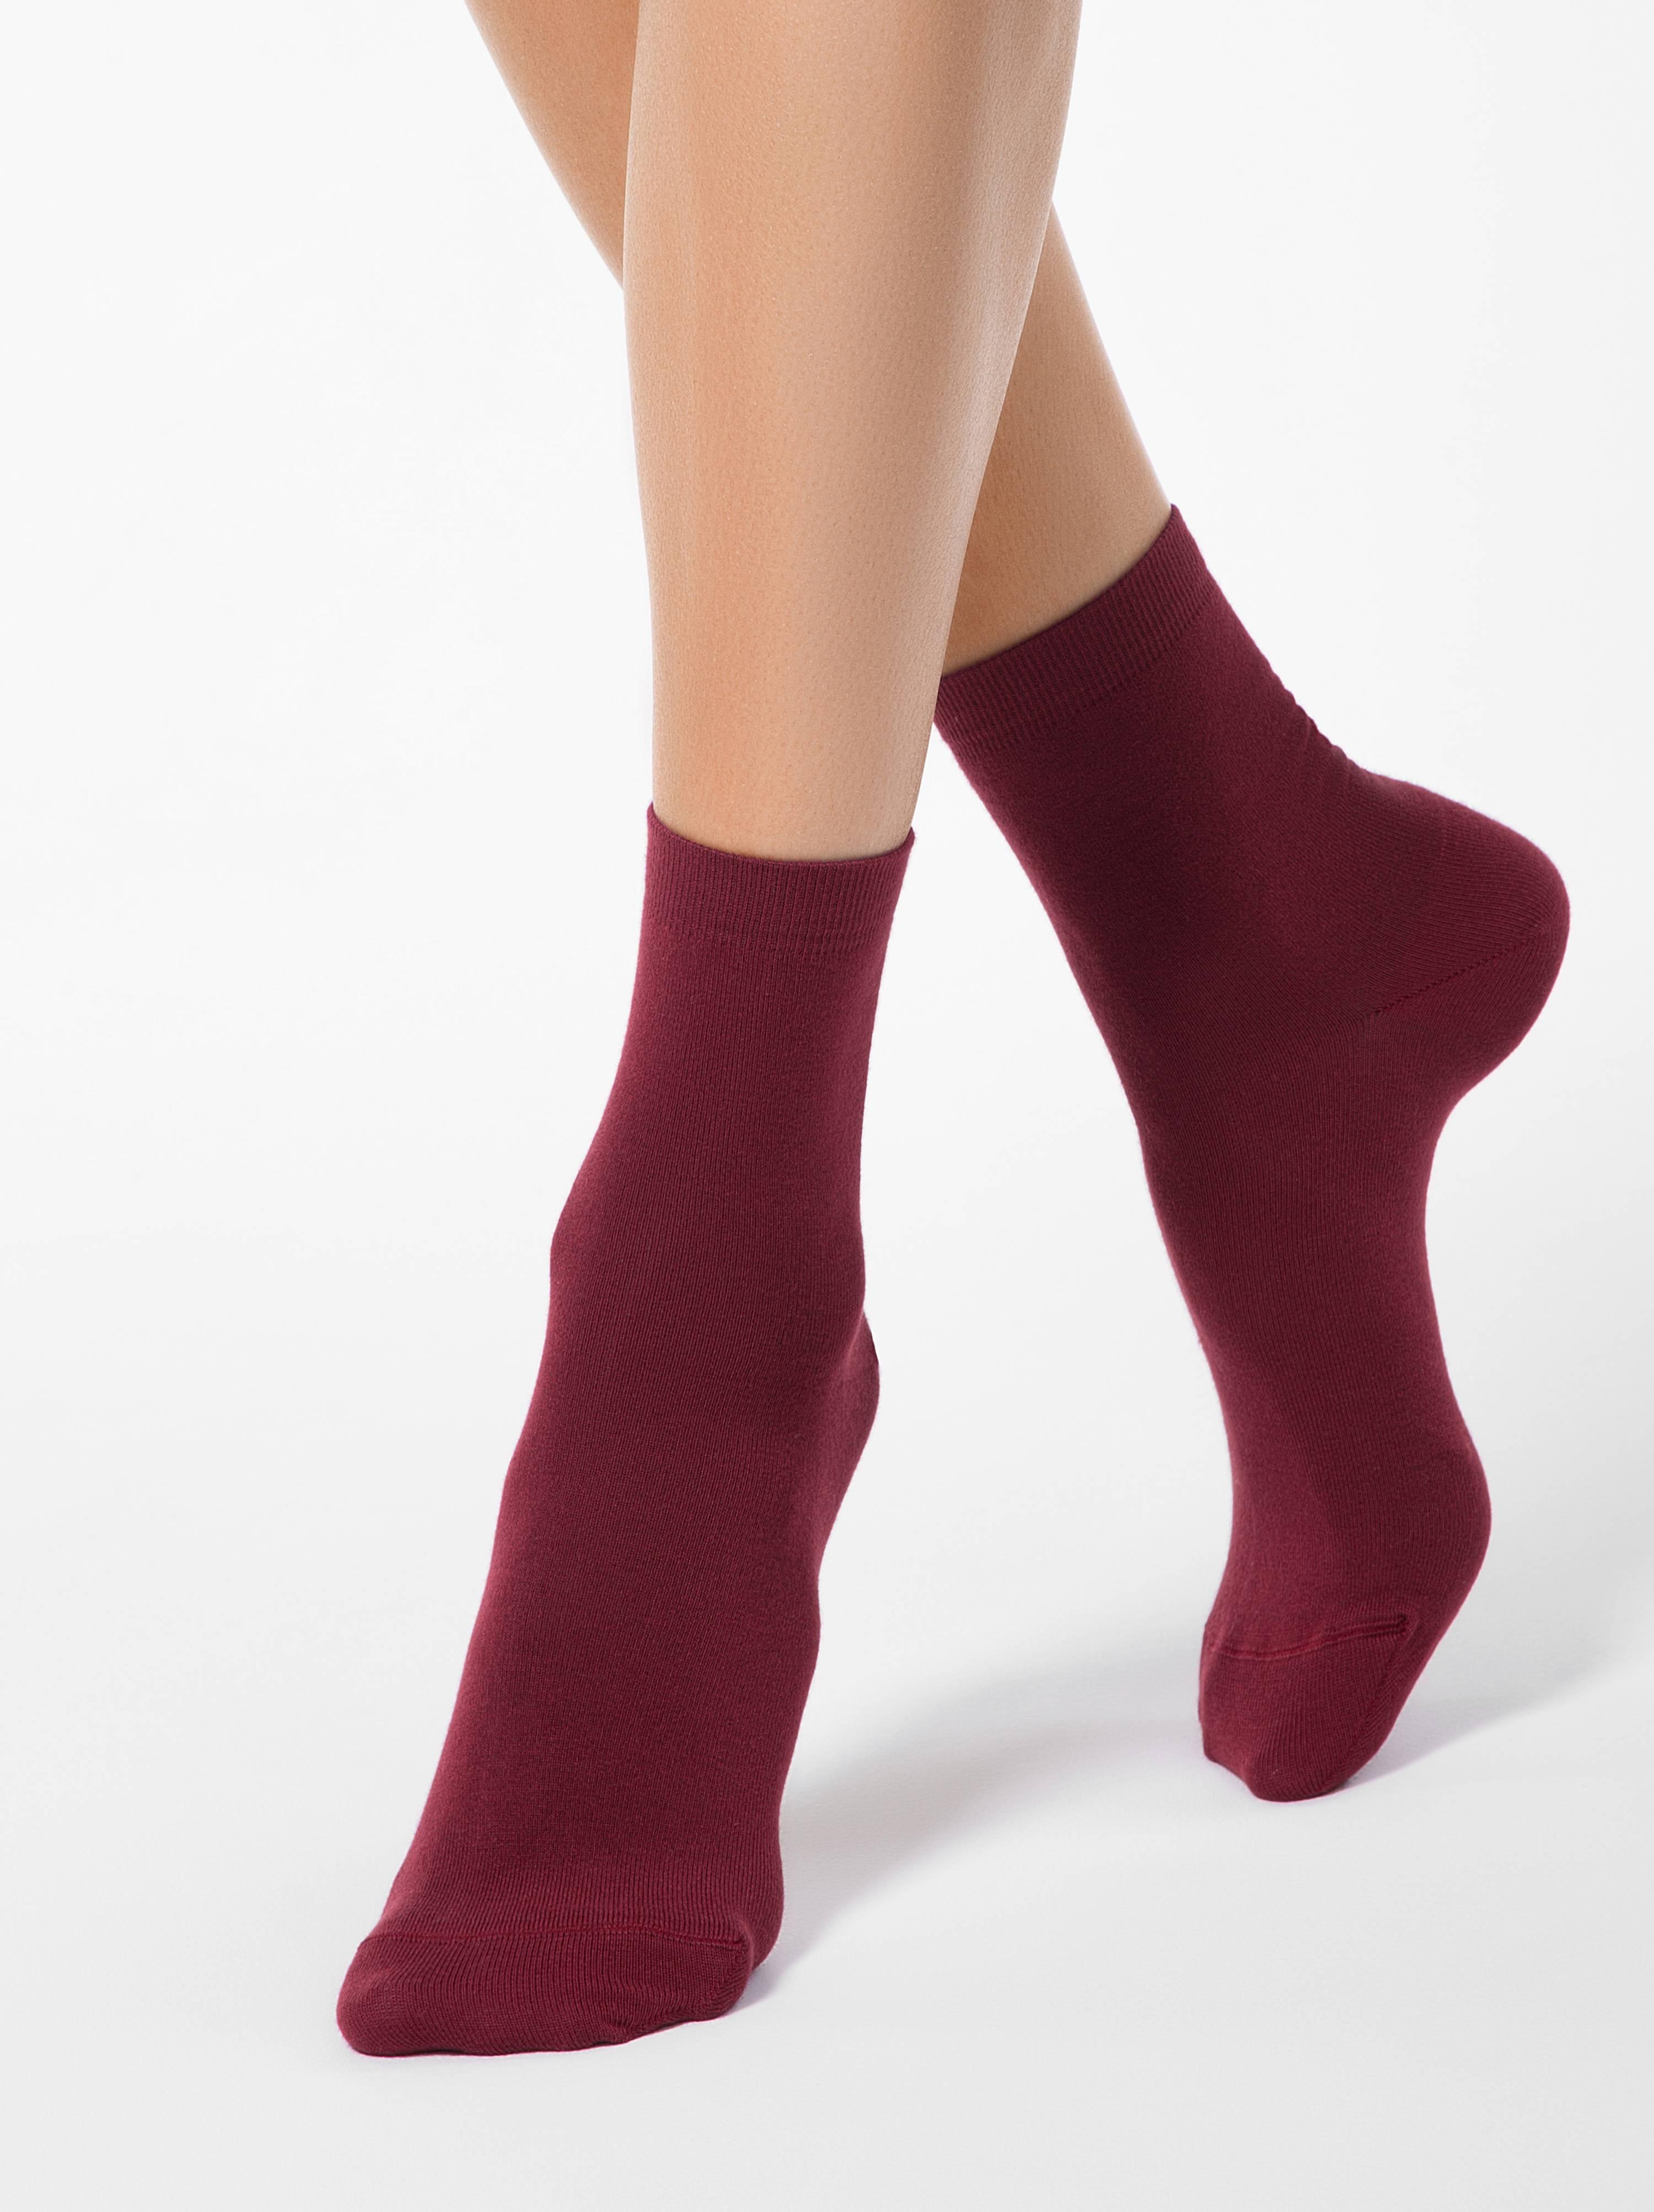 Носки вискозные женские ⭐️ CLASSIC (микромодал) ⭐️